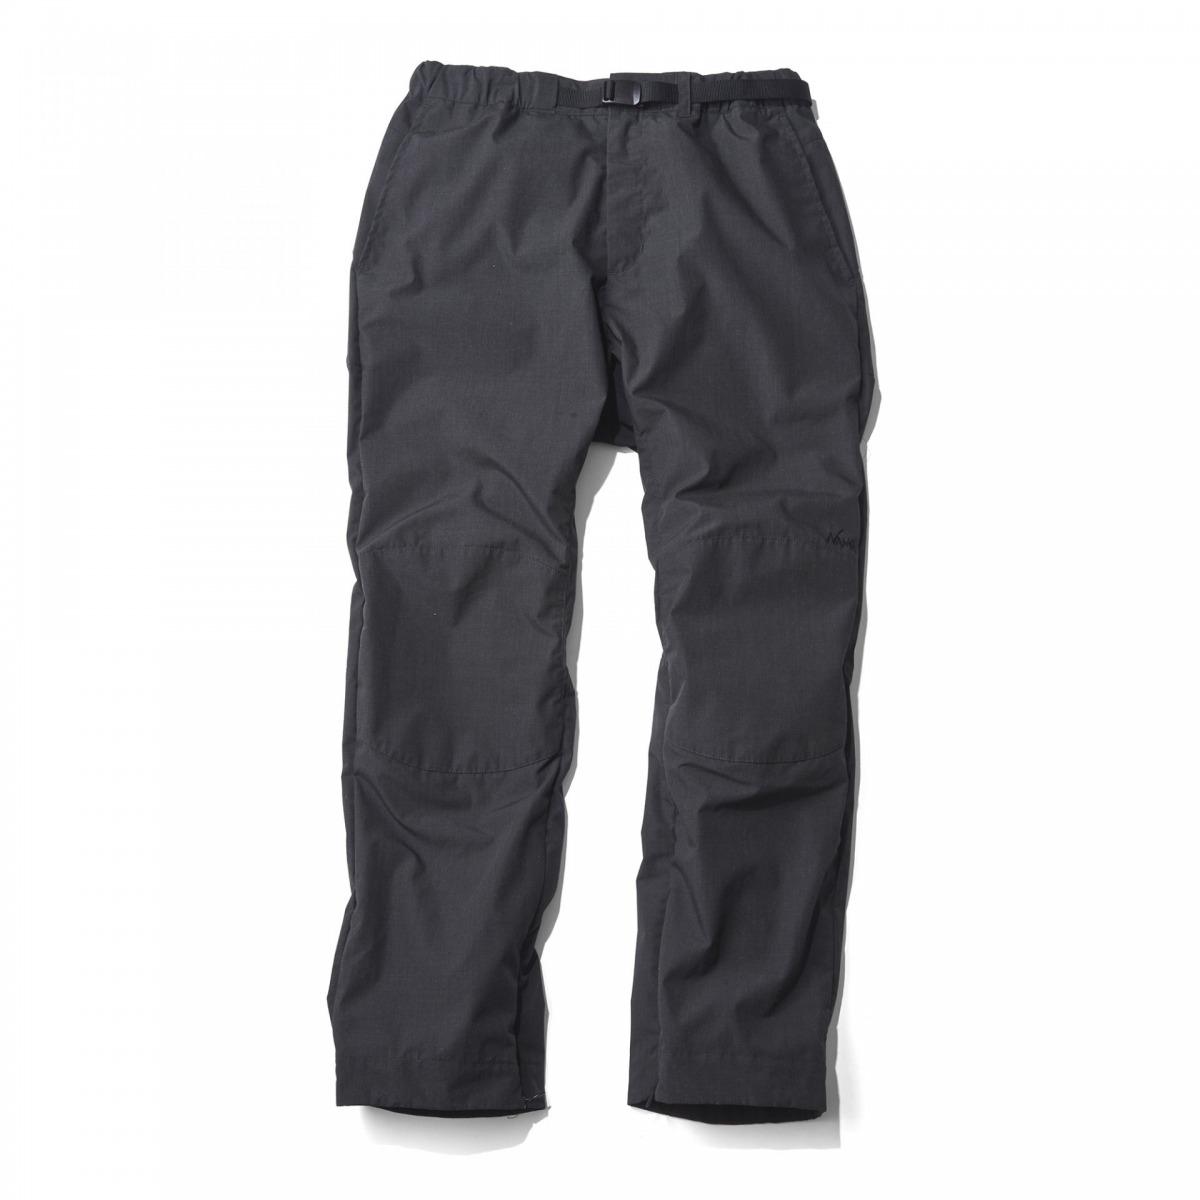 TAKIBI FIELD OVER PANTS / タキビフィールドオーバーパンツ